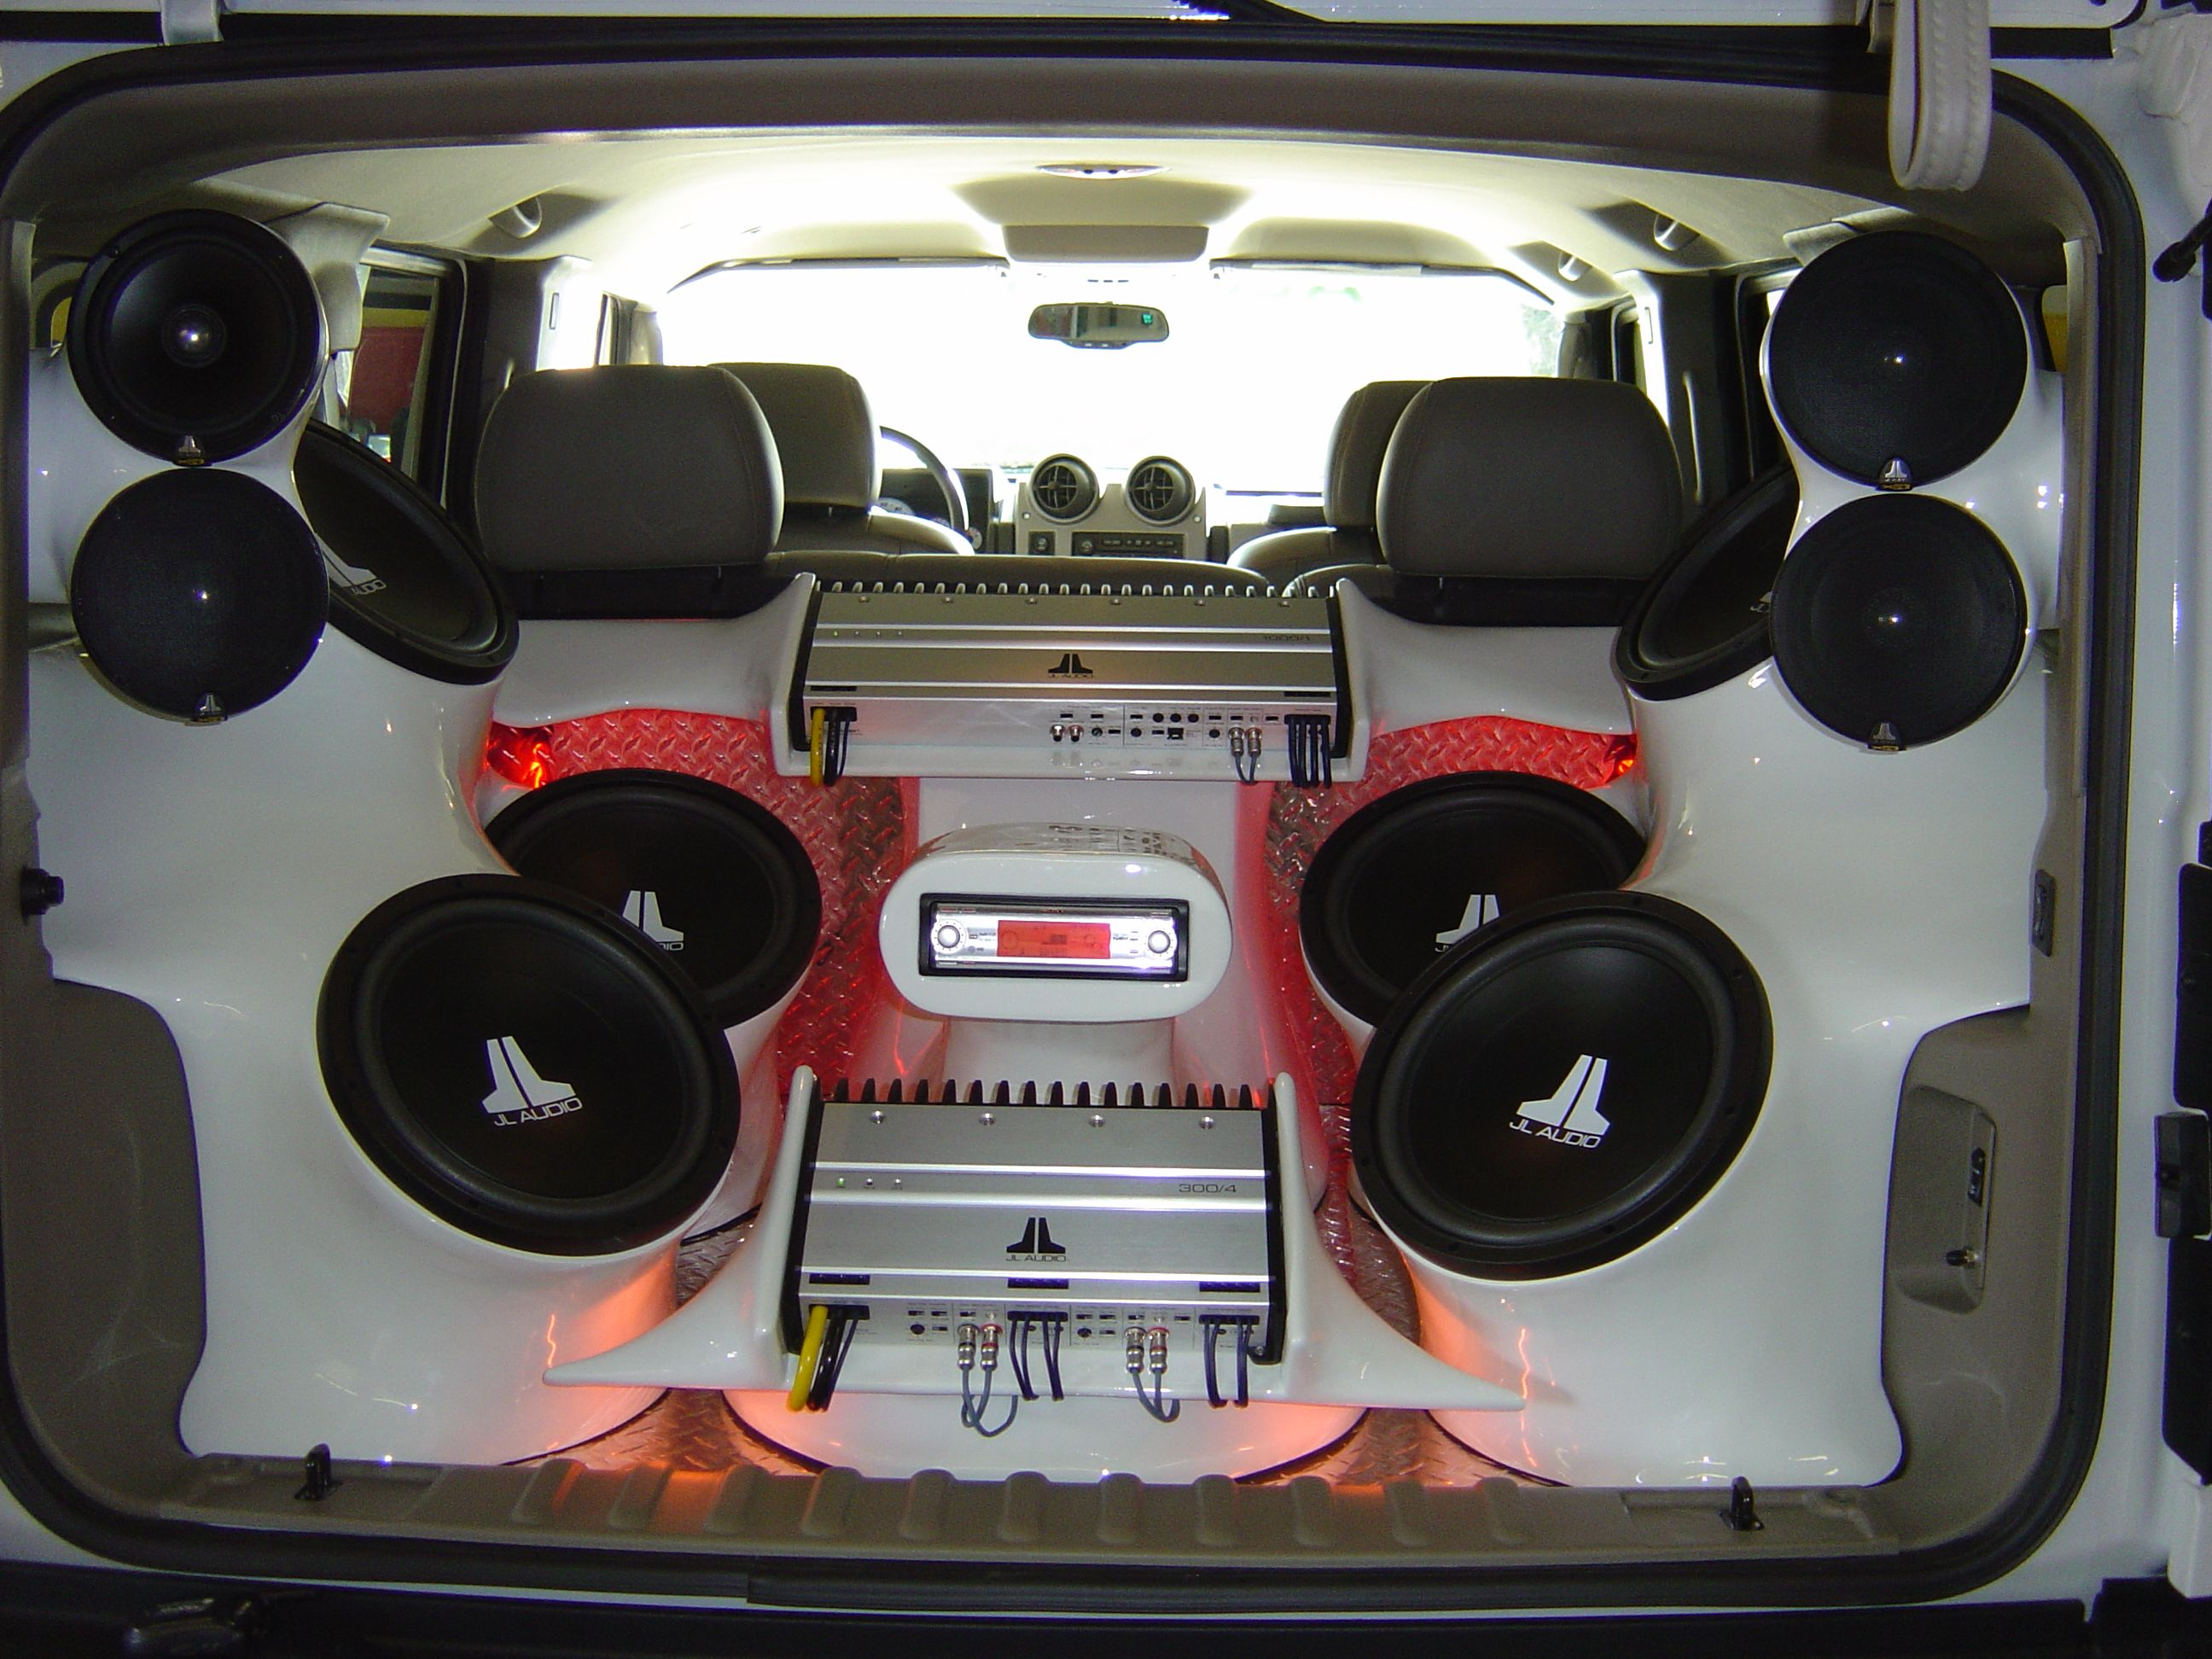 Ken S Car Tunes Photo Gallery Car Audio Installation Car Audio Car Stereo Systems